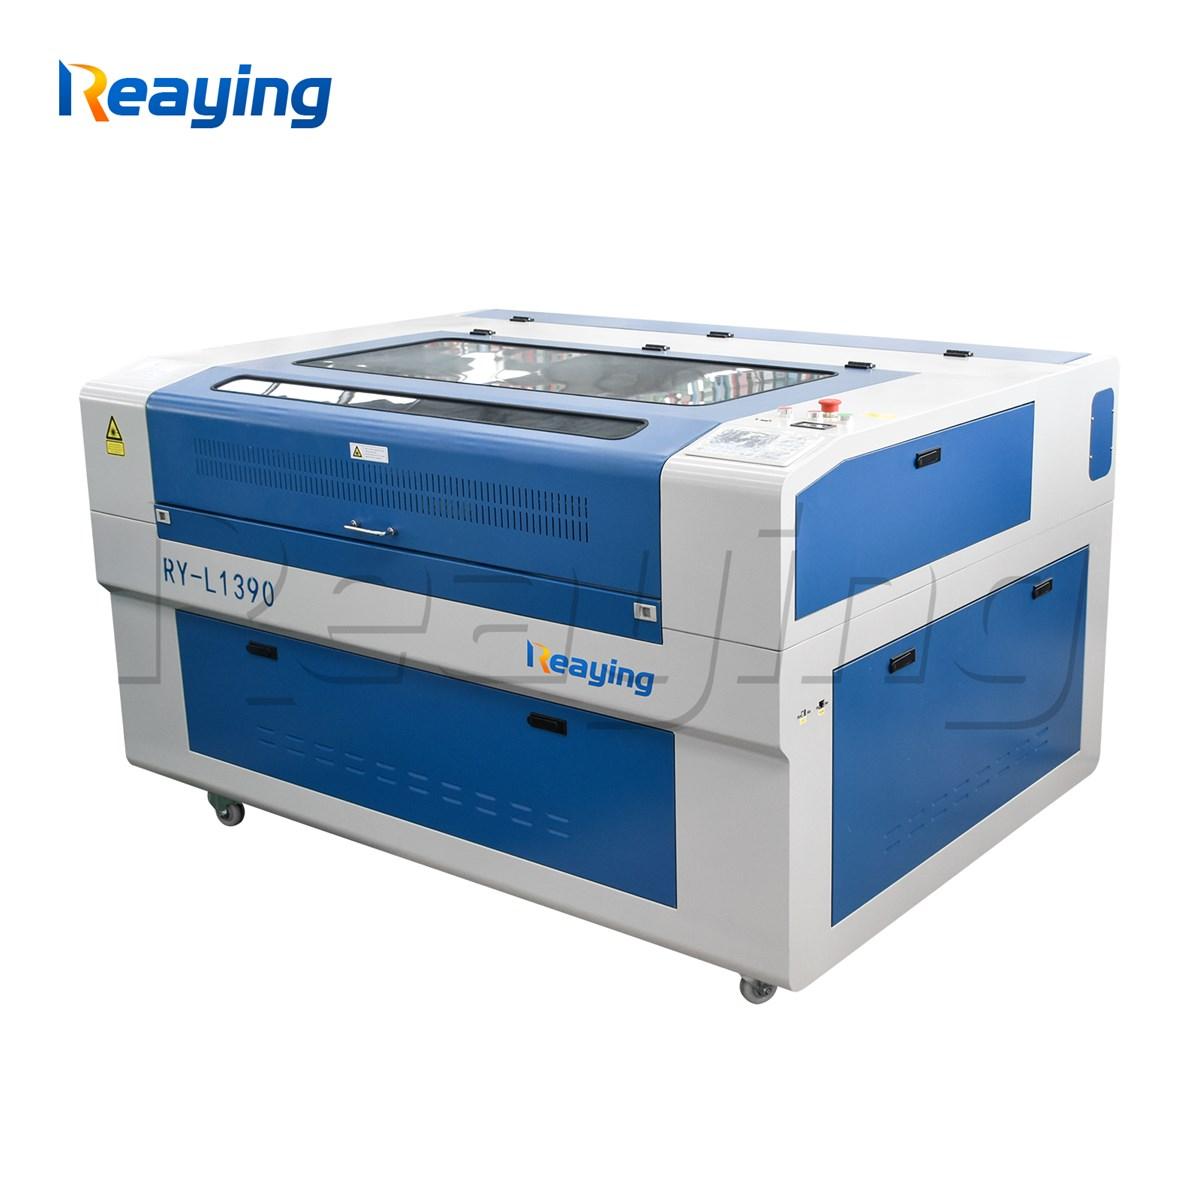 CNC CO2 laser engraving cutting machine RYL1390 ruida control system laser engraver machine offline work